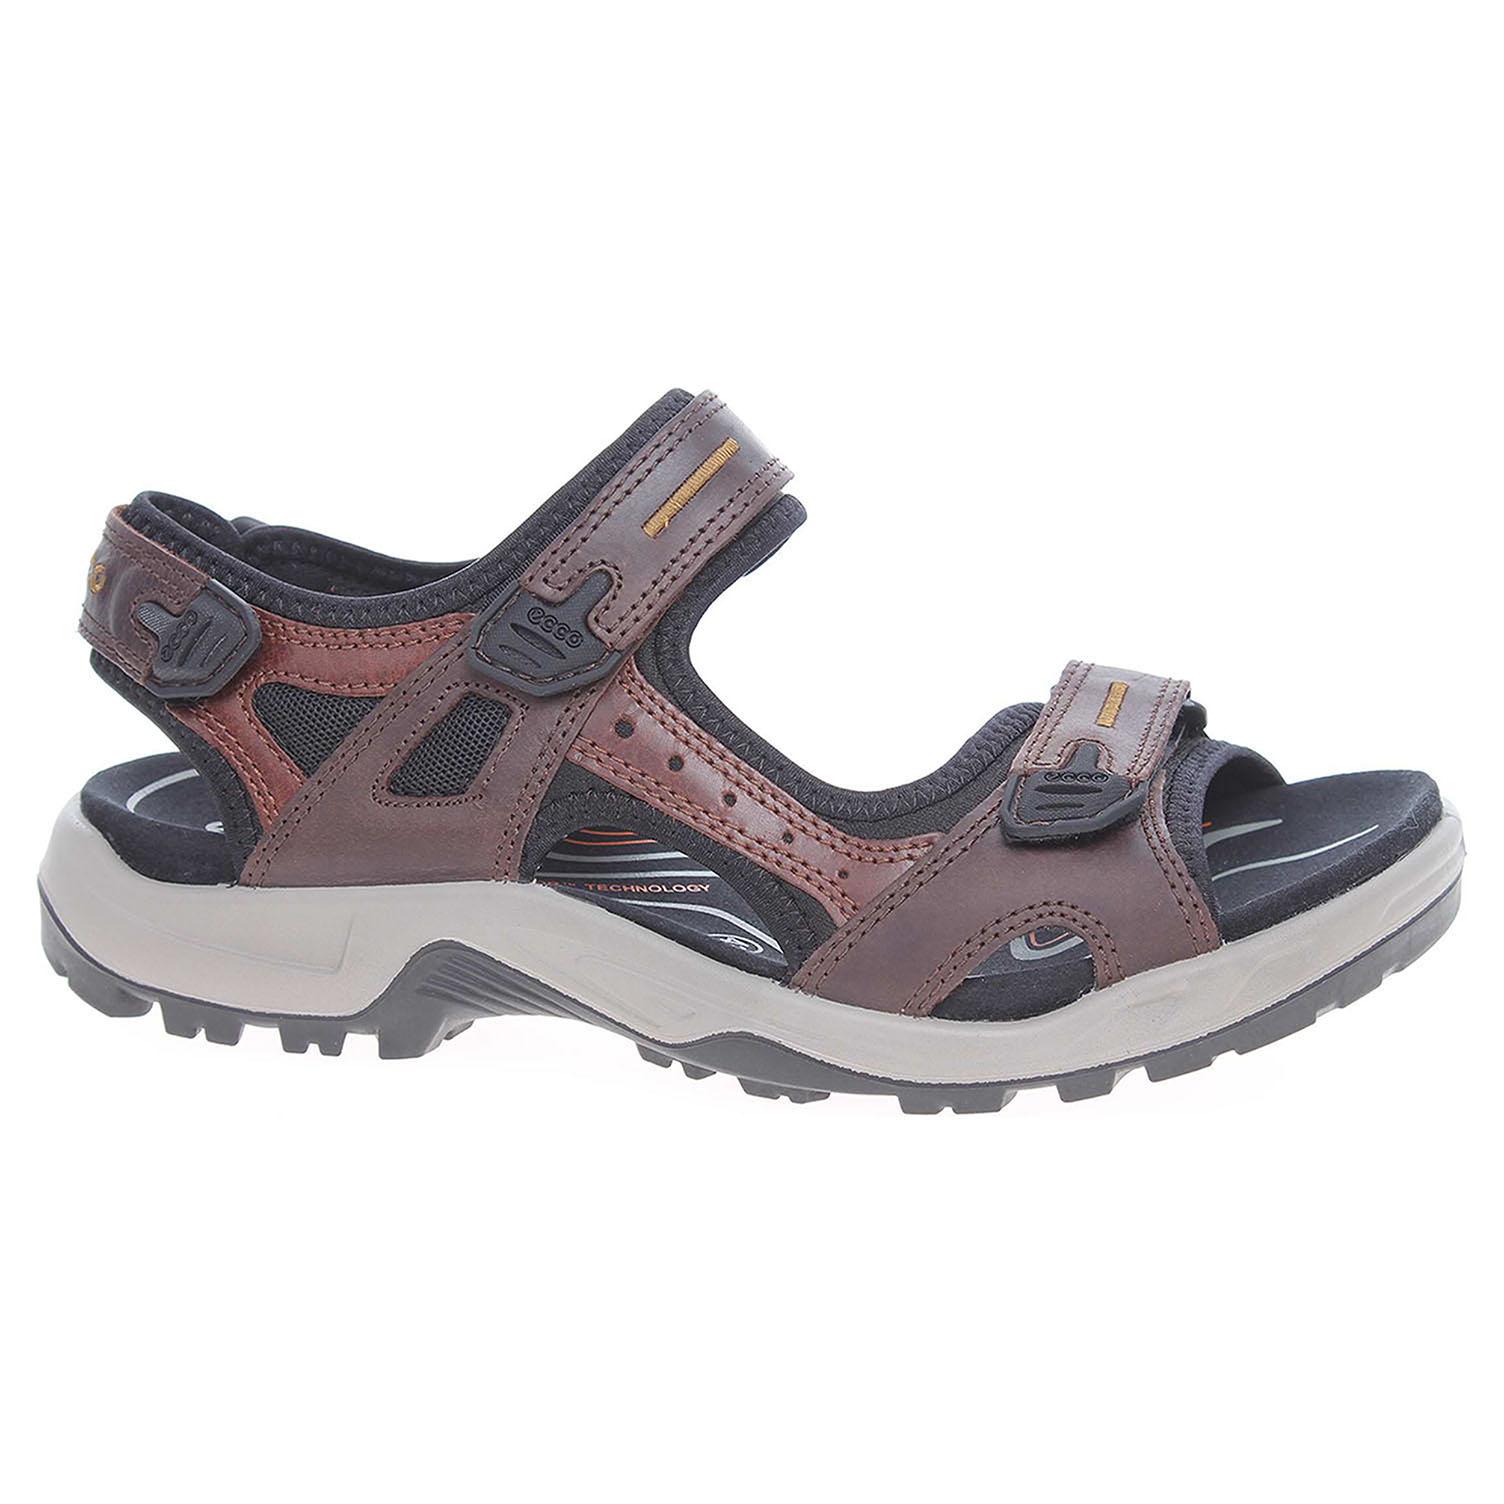 49e7848b8e72 Ecco Pánské sandály Ecco Offroad 06956456401 hnědé 24700249